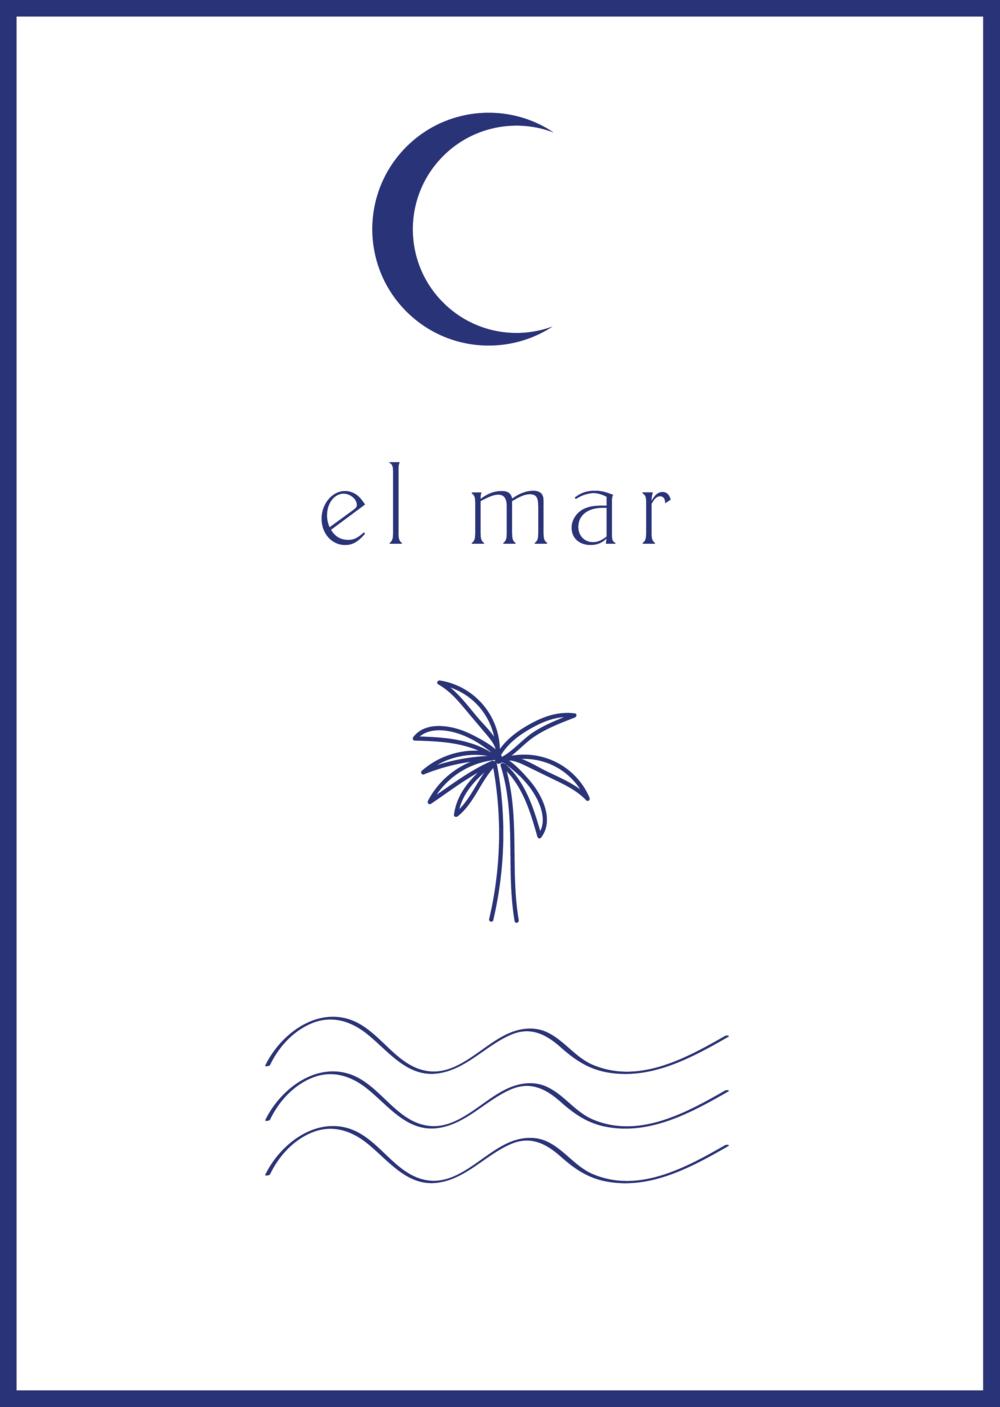 el mar // phylleli design studio and blog